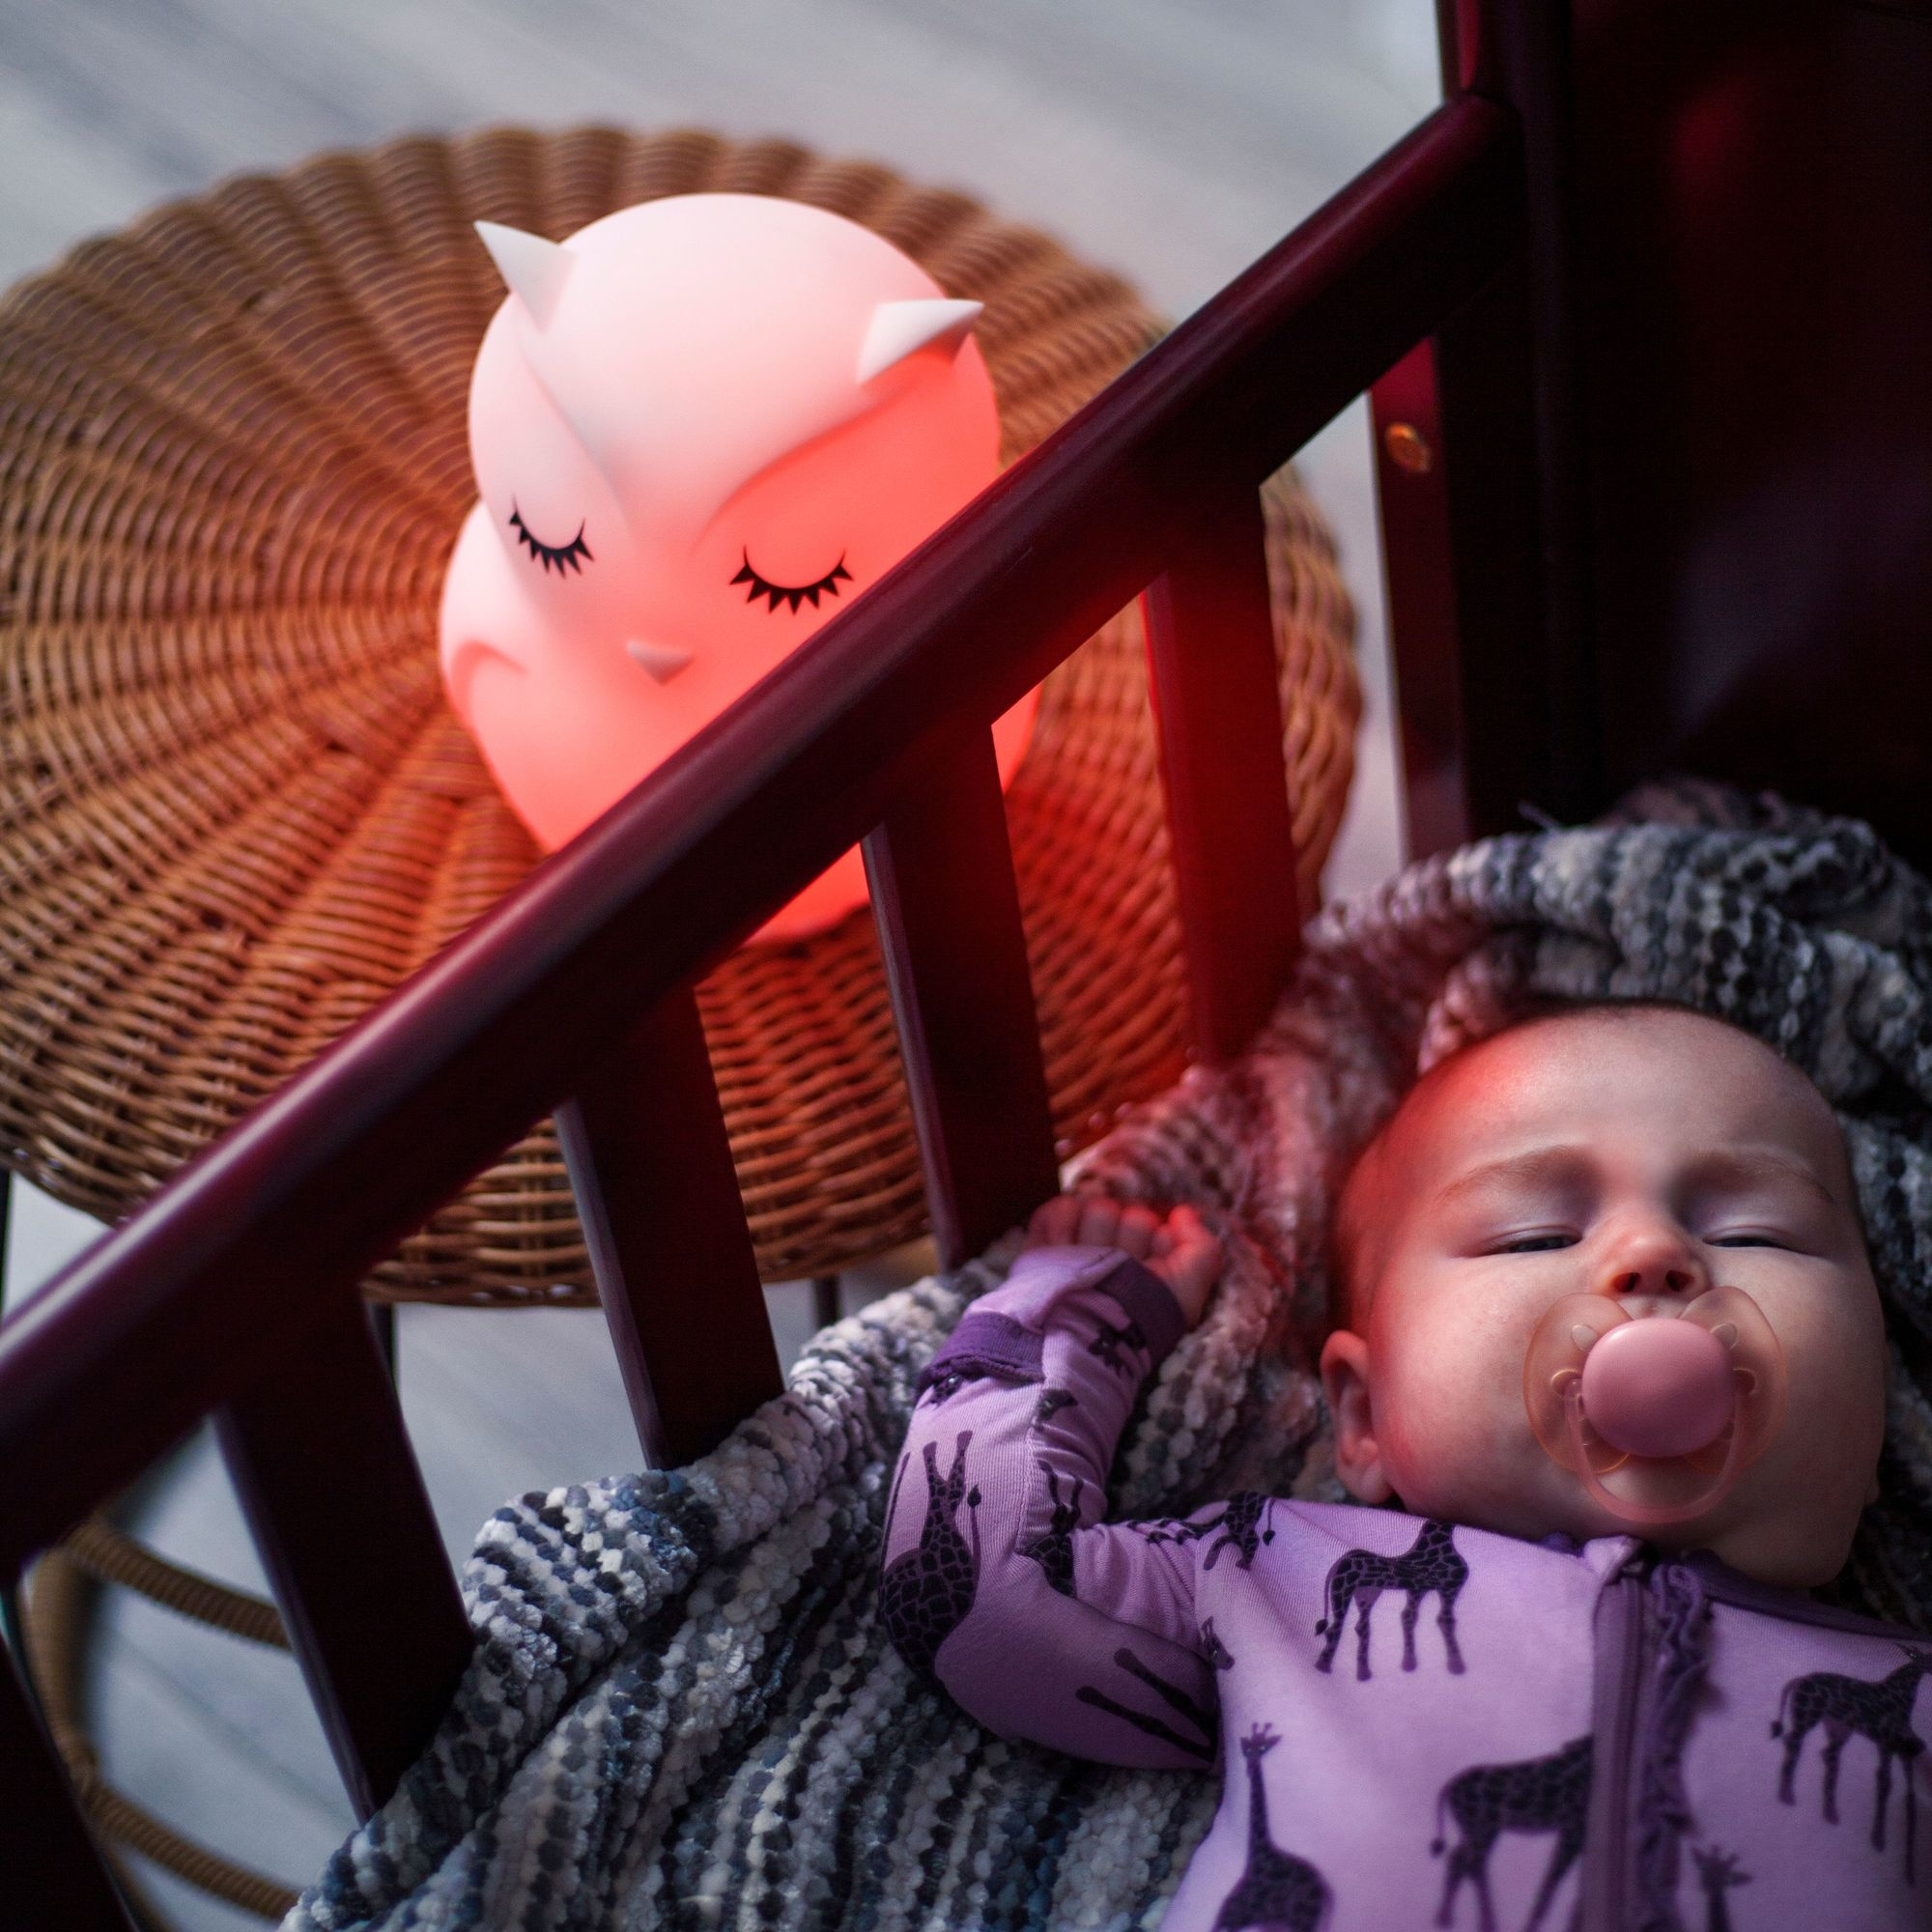 LumieWorld LumieWorld LumiPets LED Baby Nightlight